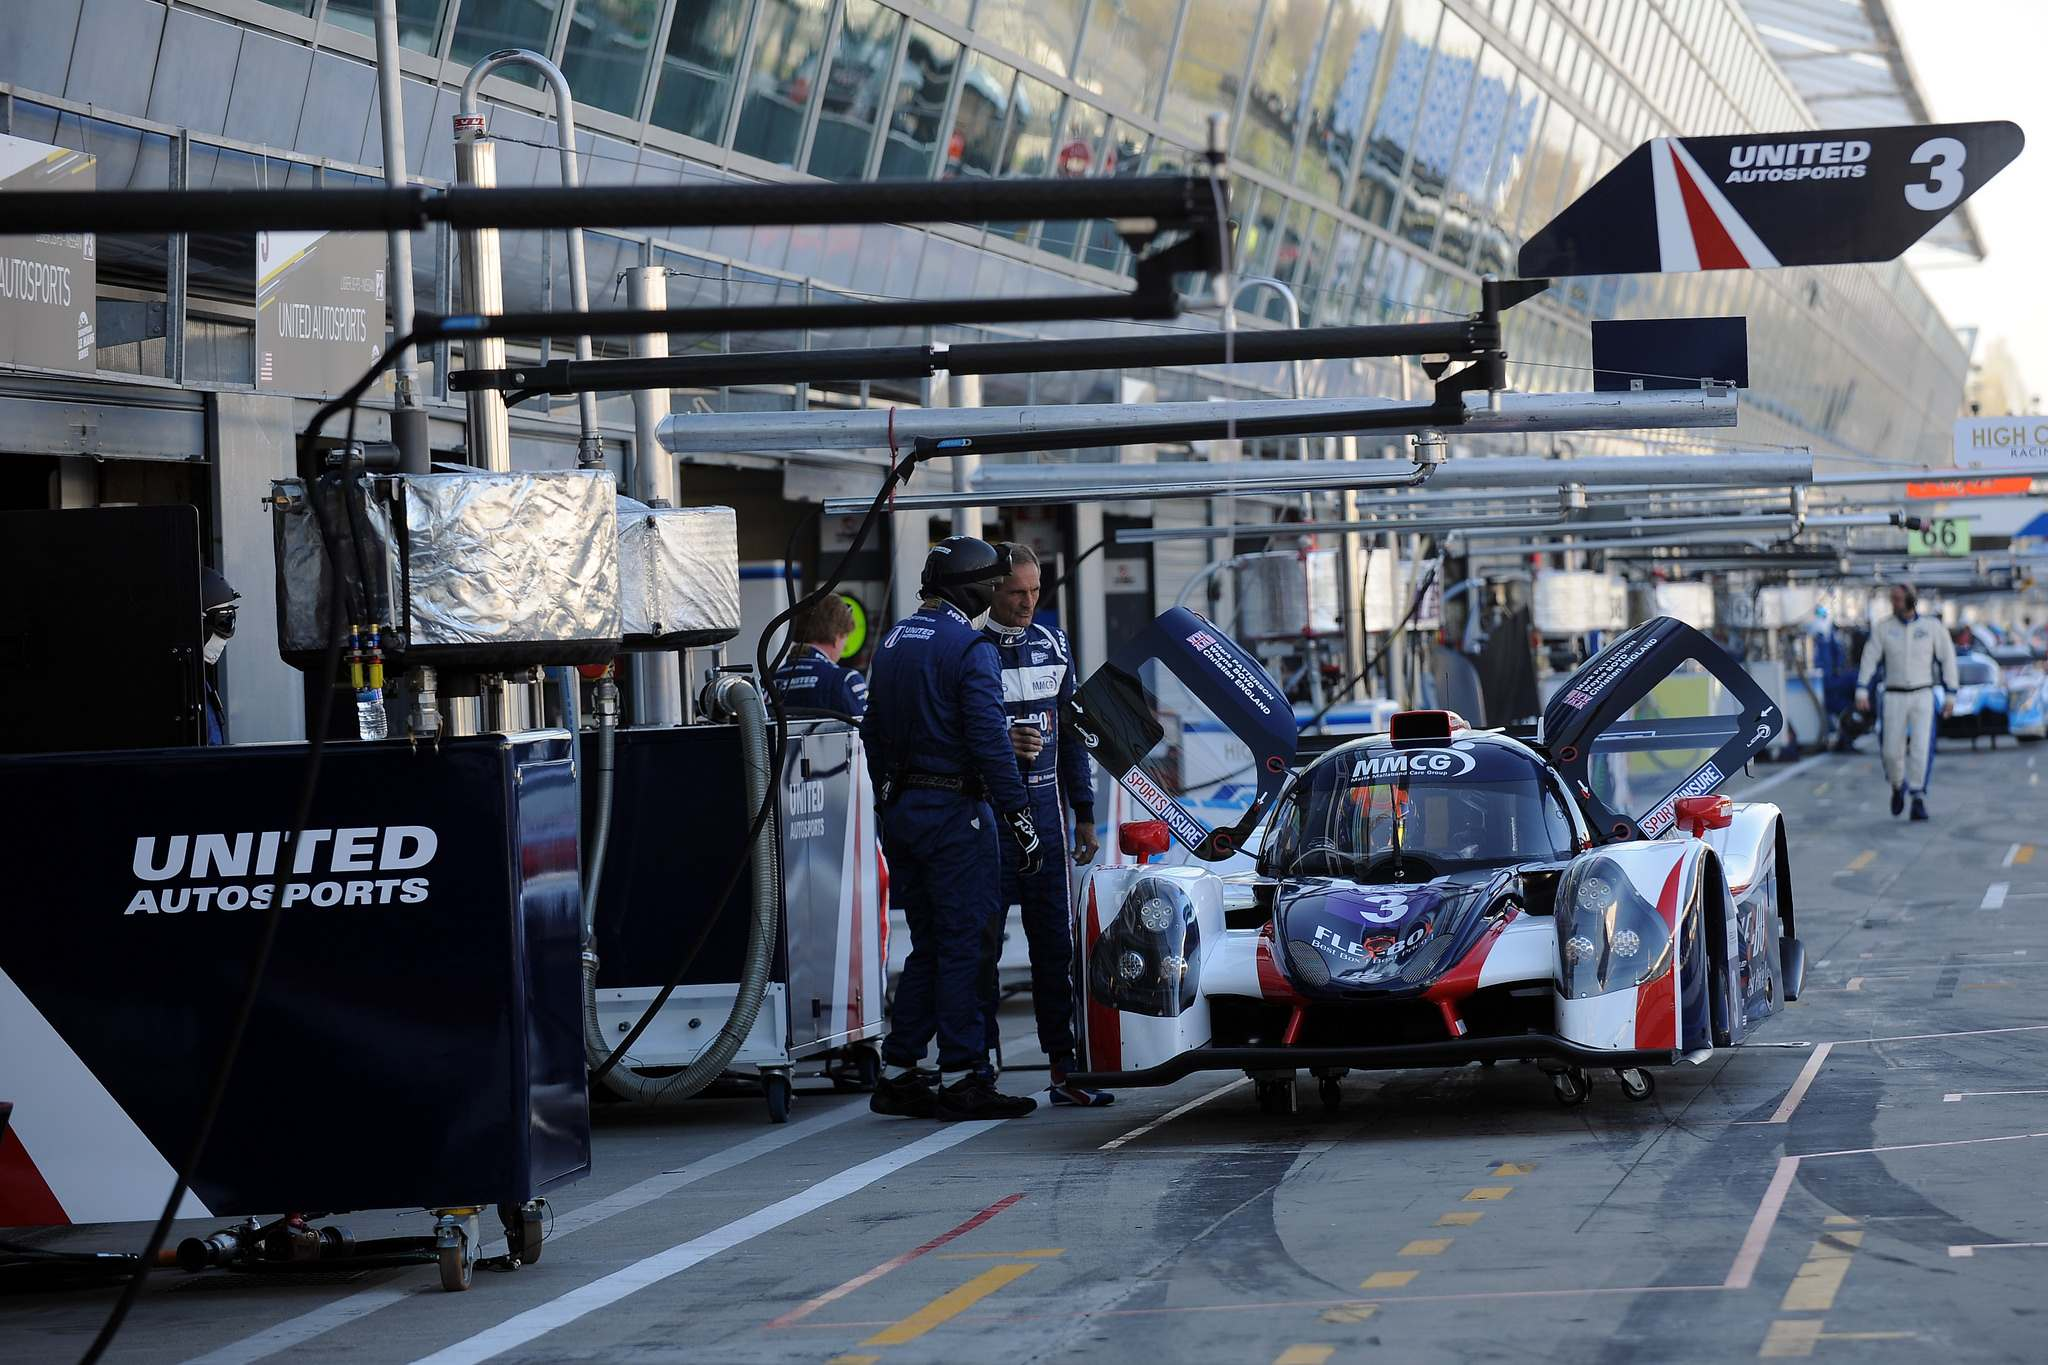 unitedautosports8 United Autosports in Monza